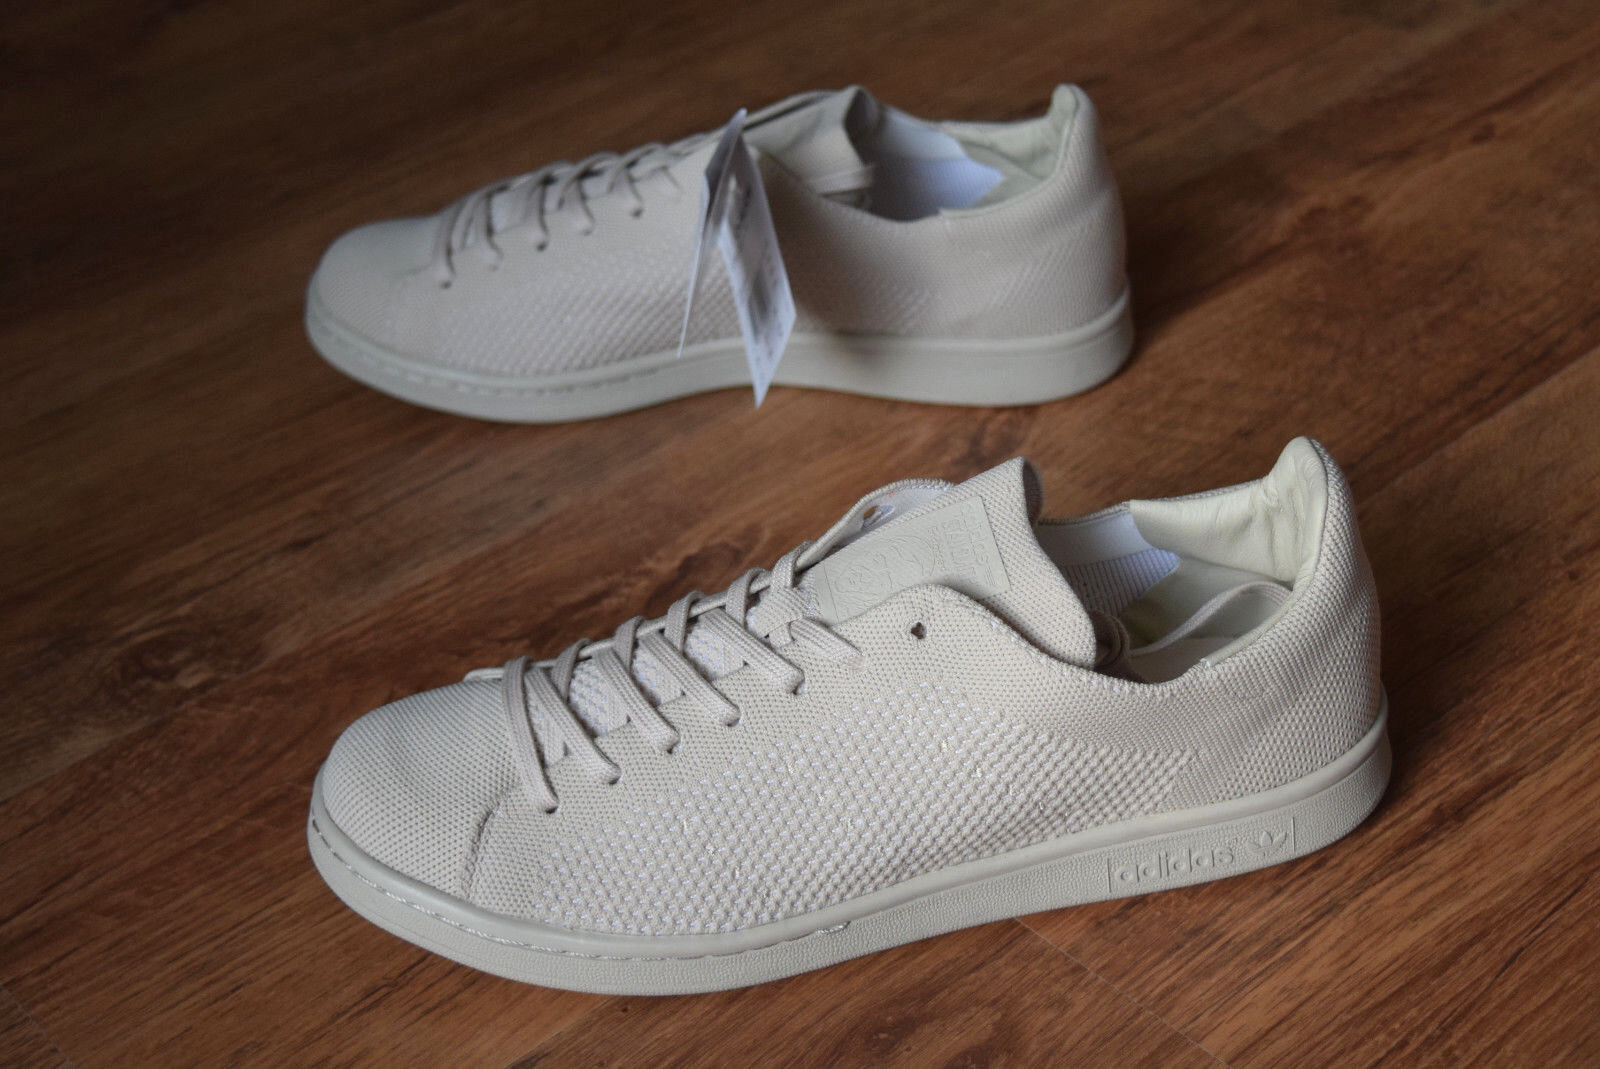 Adidas Stan Smith Pk 40 41 42 43 44 45 S82156 Primeknit Superstar Campus Gazelle